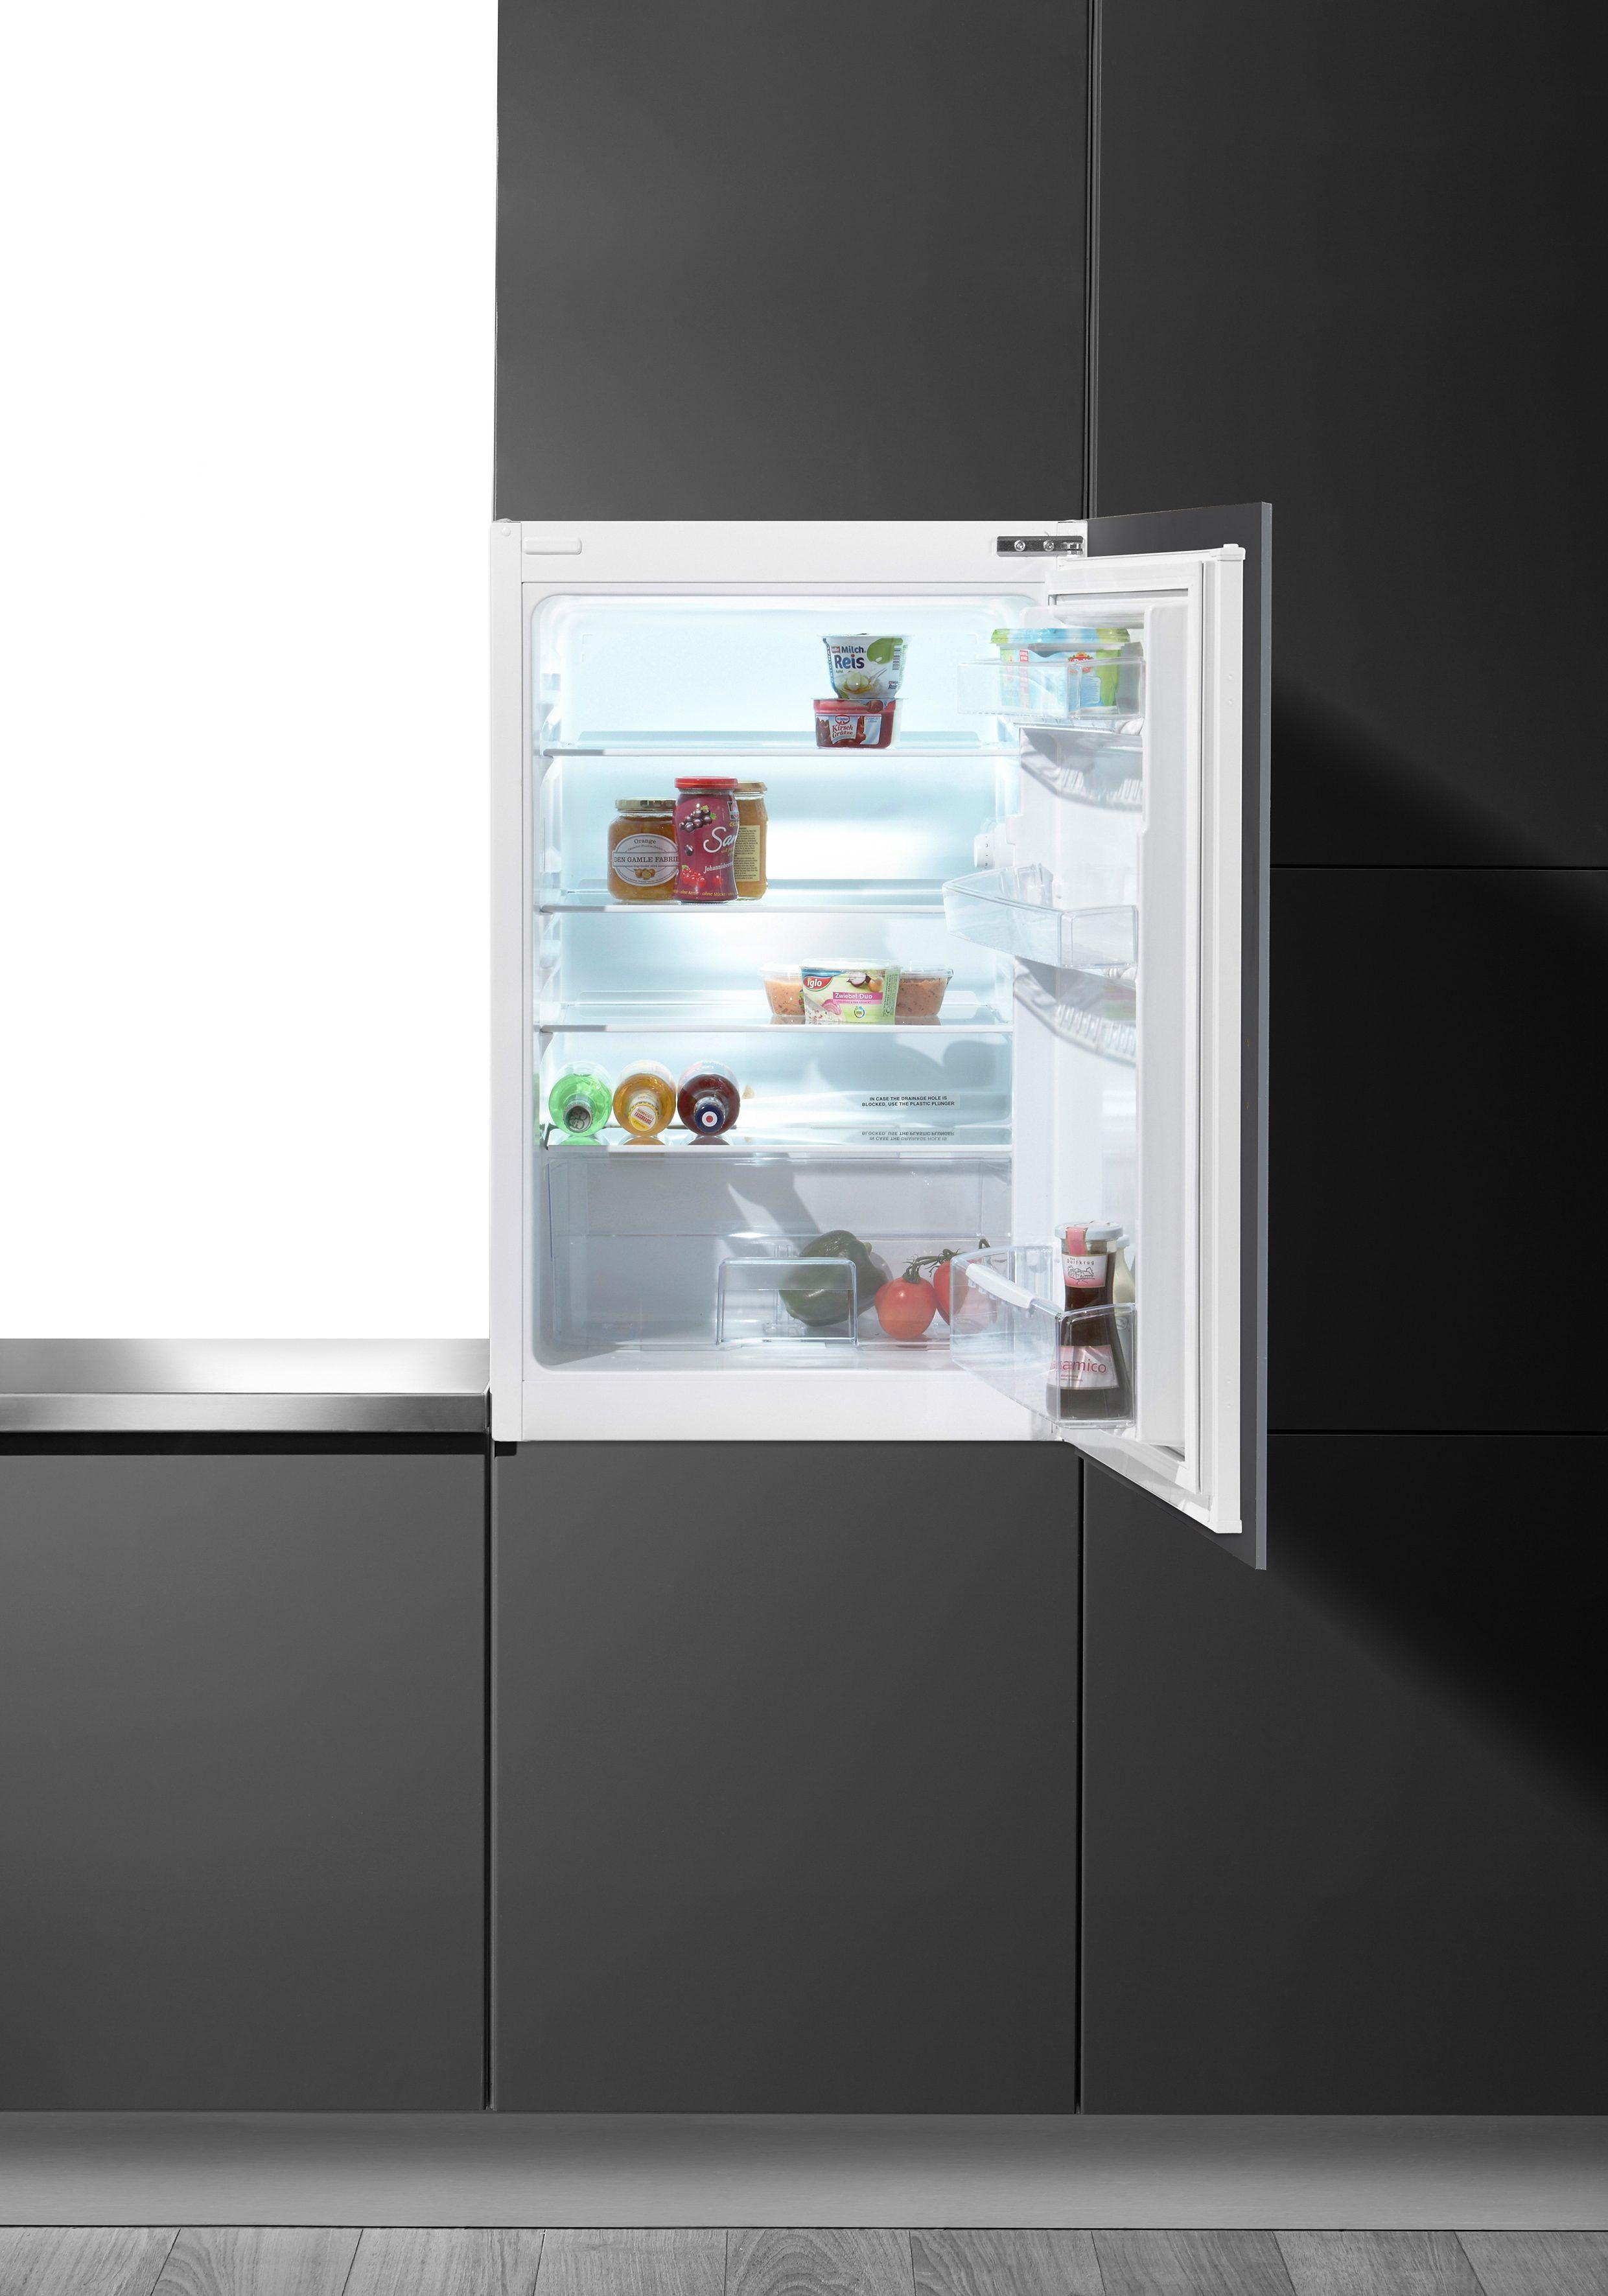 Beko integrierbarer Einbaukühlschrank »B 1802«, A++, 88 cm